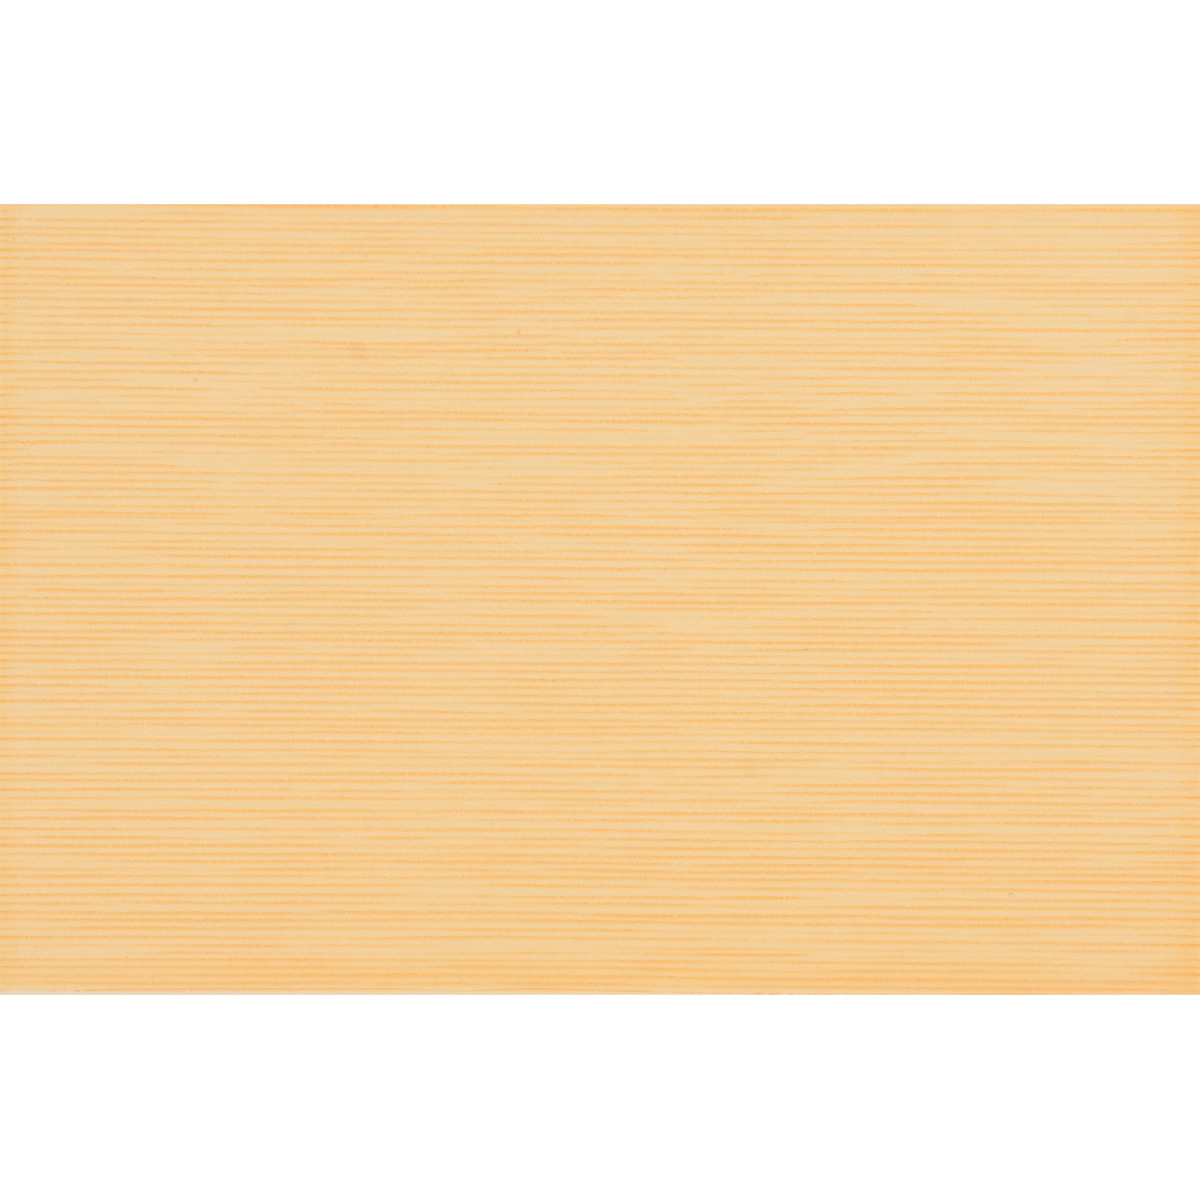 Плитка настенная Spa 20х30 см 1.2 м2 цвет желтый